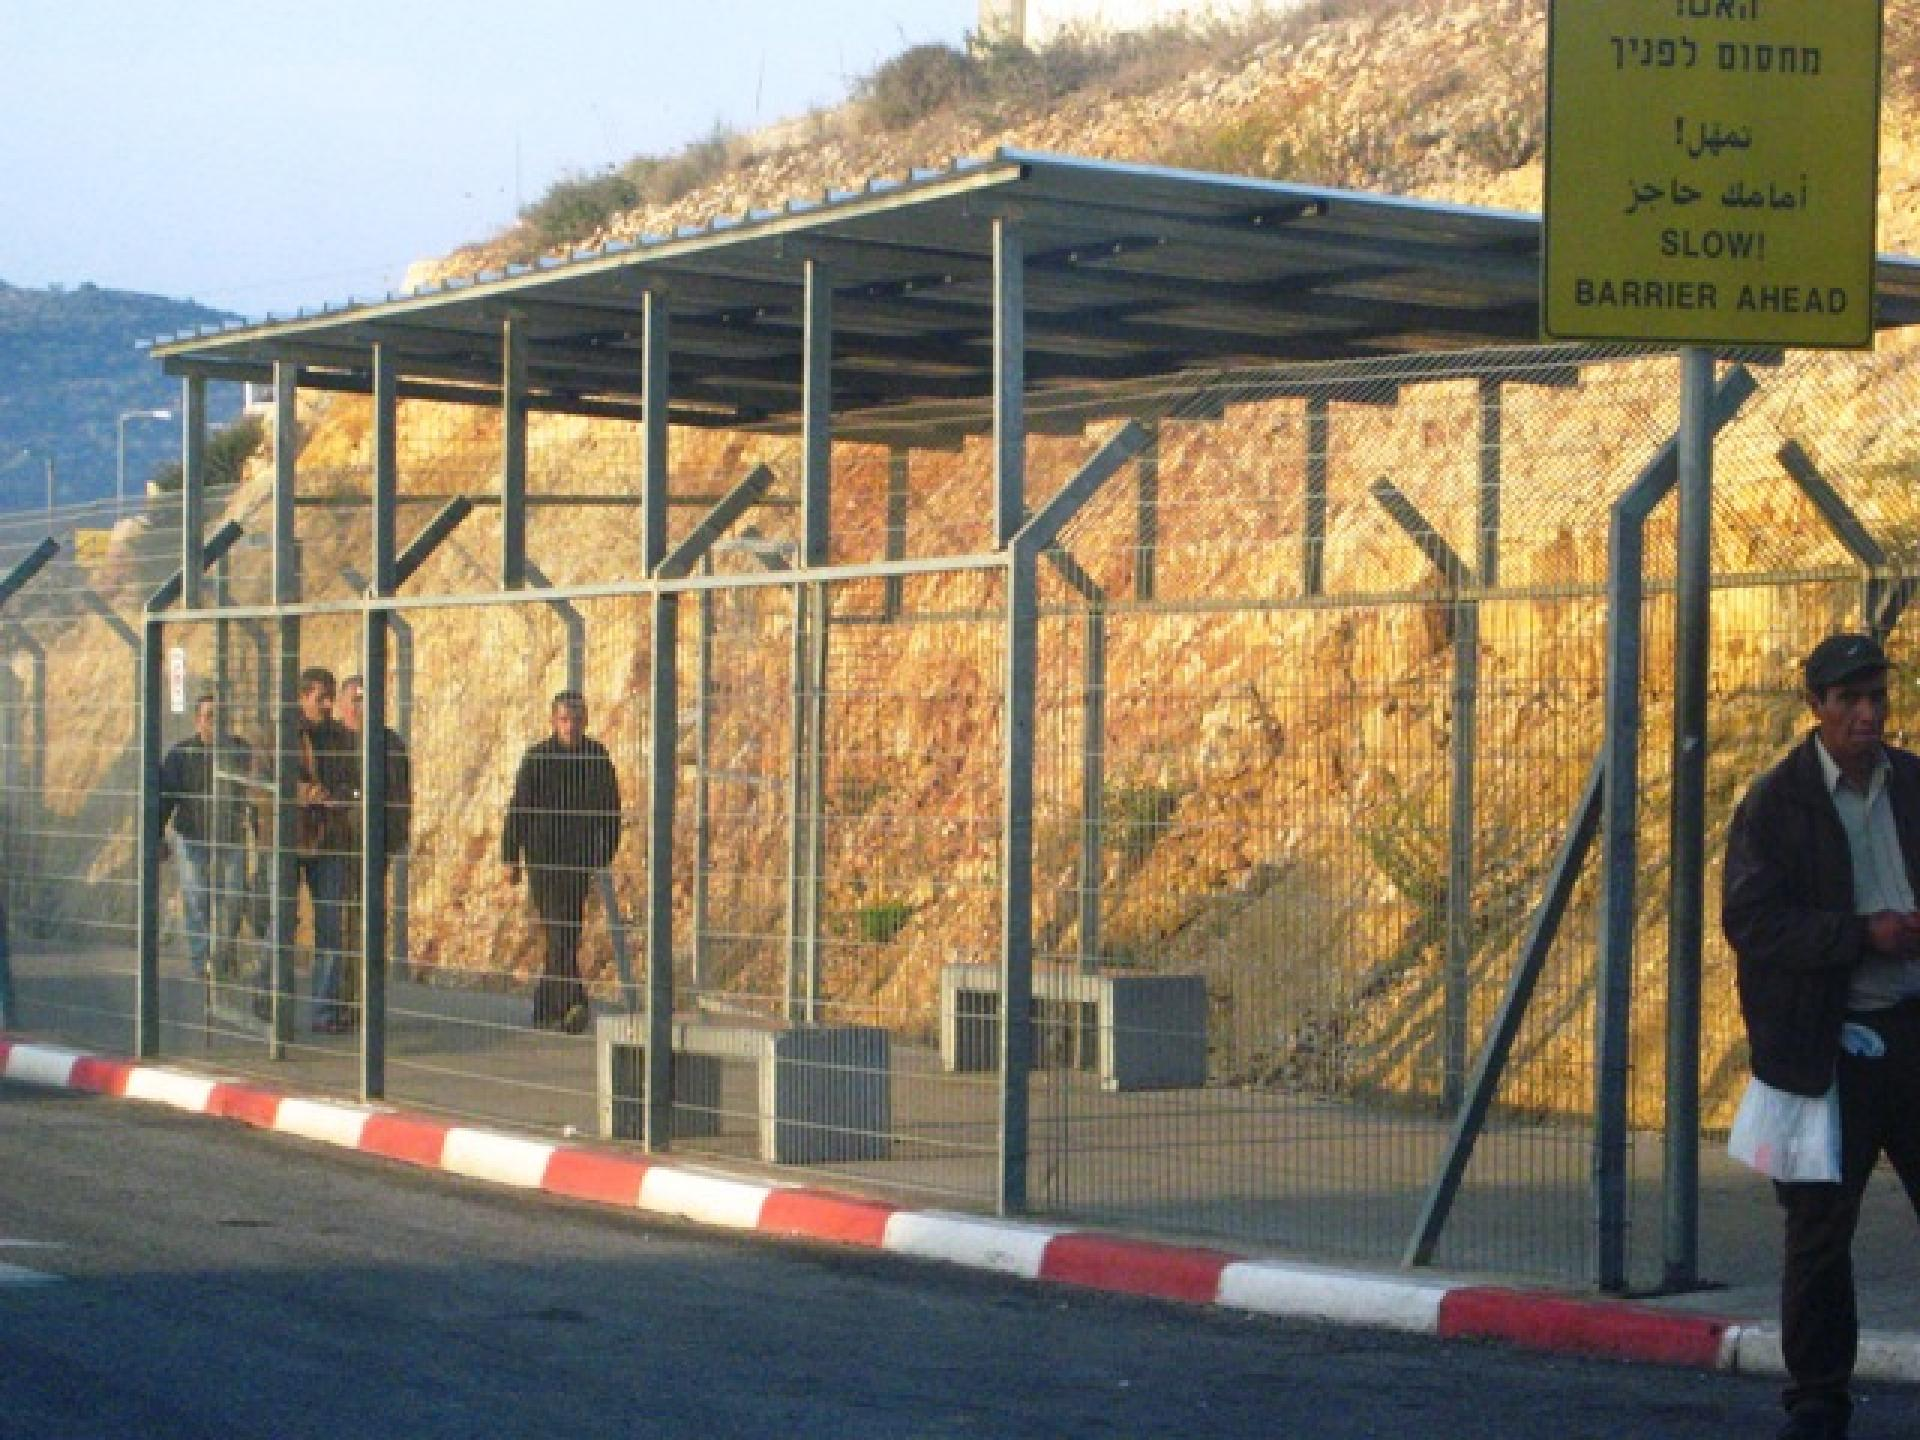 Barta'a/Reikhan checkpoint 12.11.09